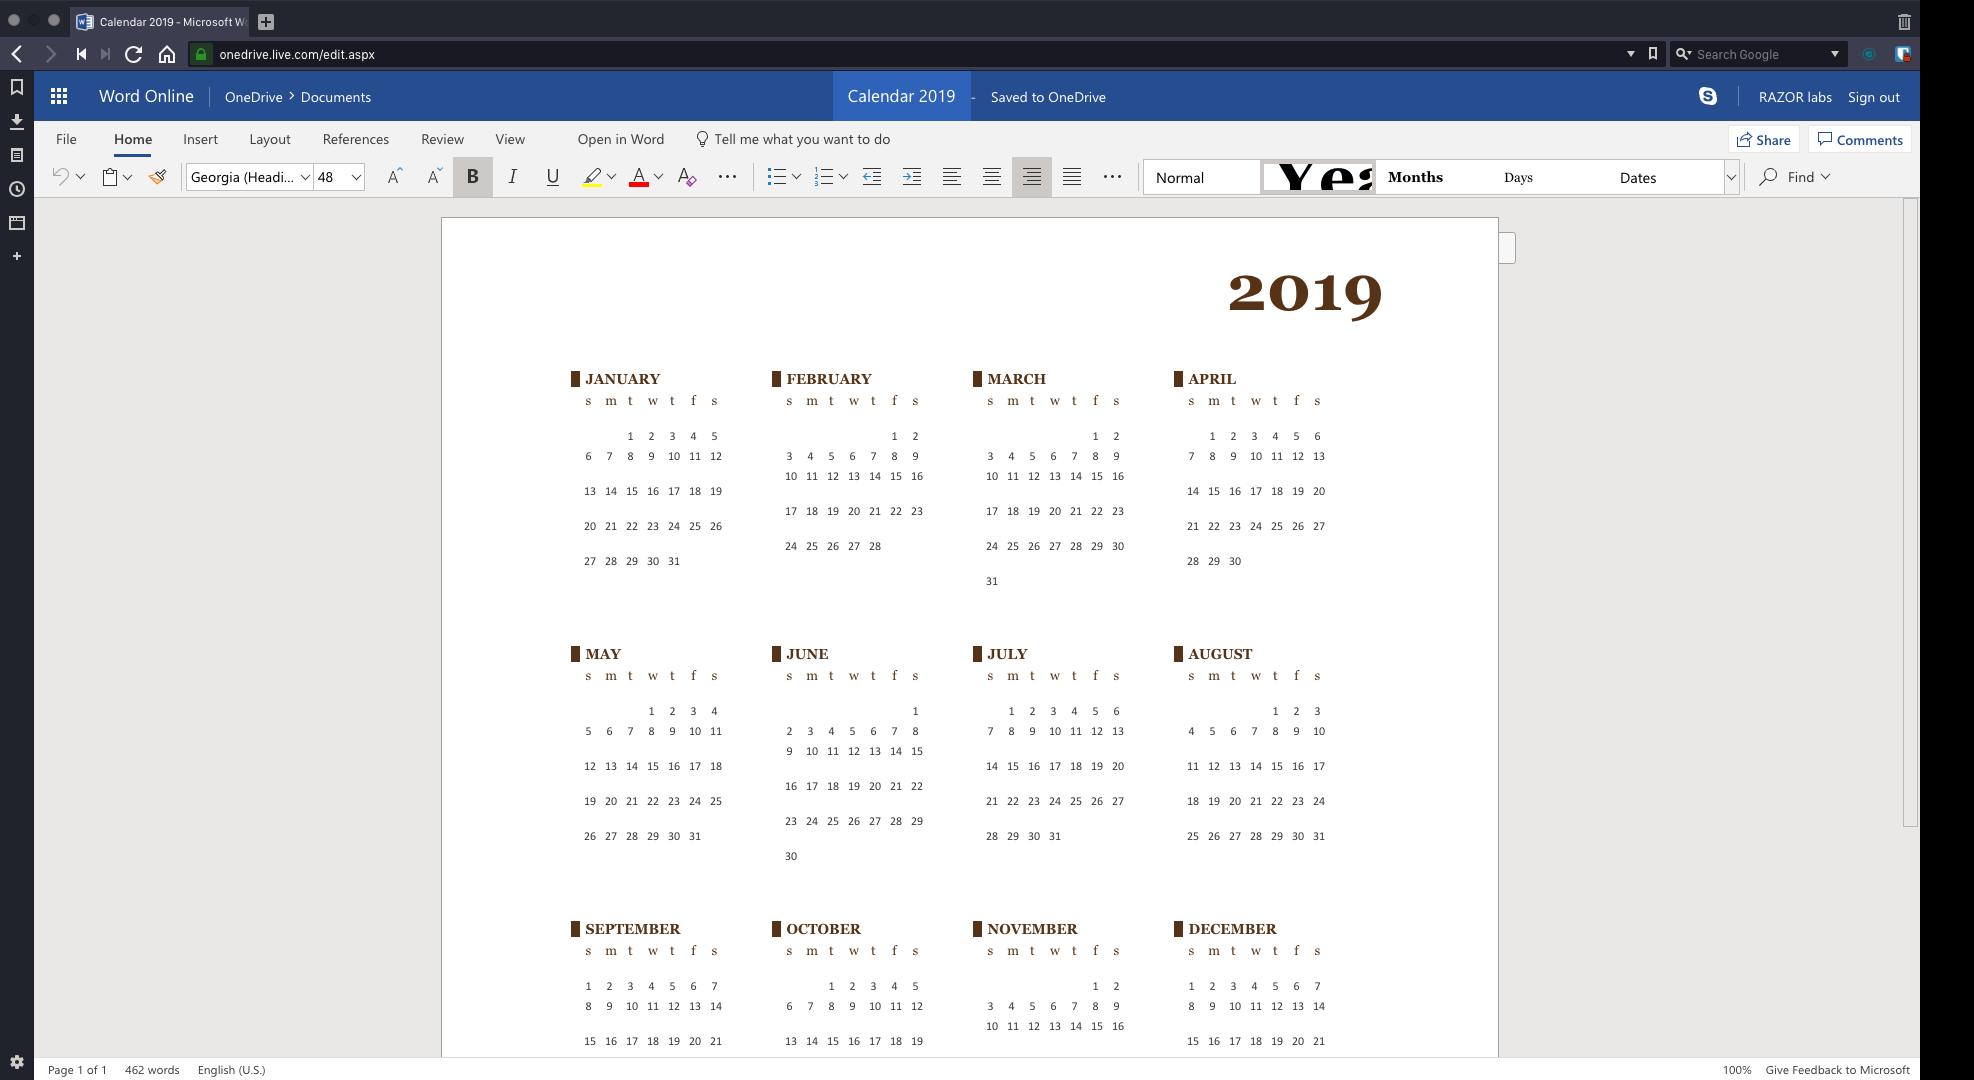 Calendar 2019 - Microsoft Word Online - Vivaldi 2019-01-14 12-53-32(1)